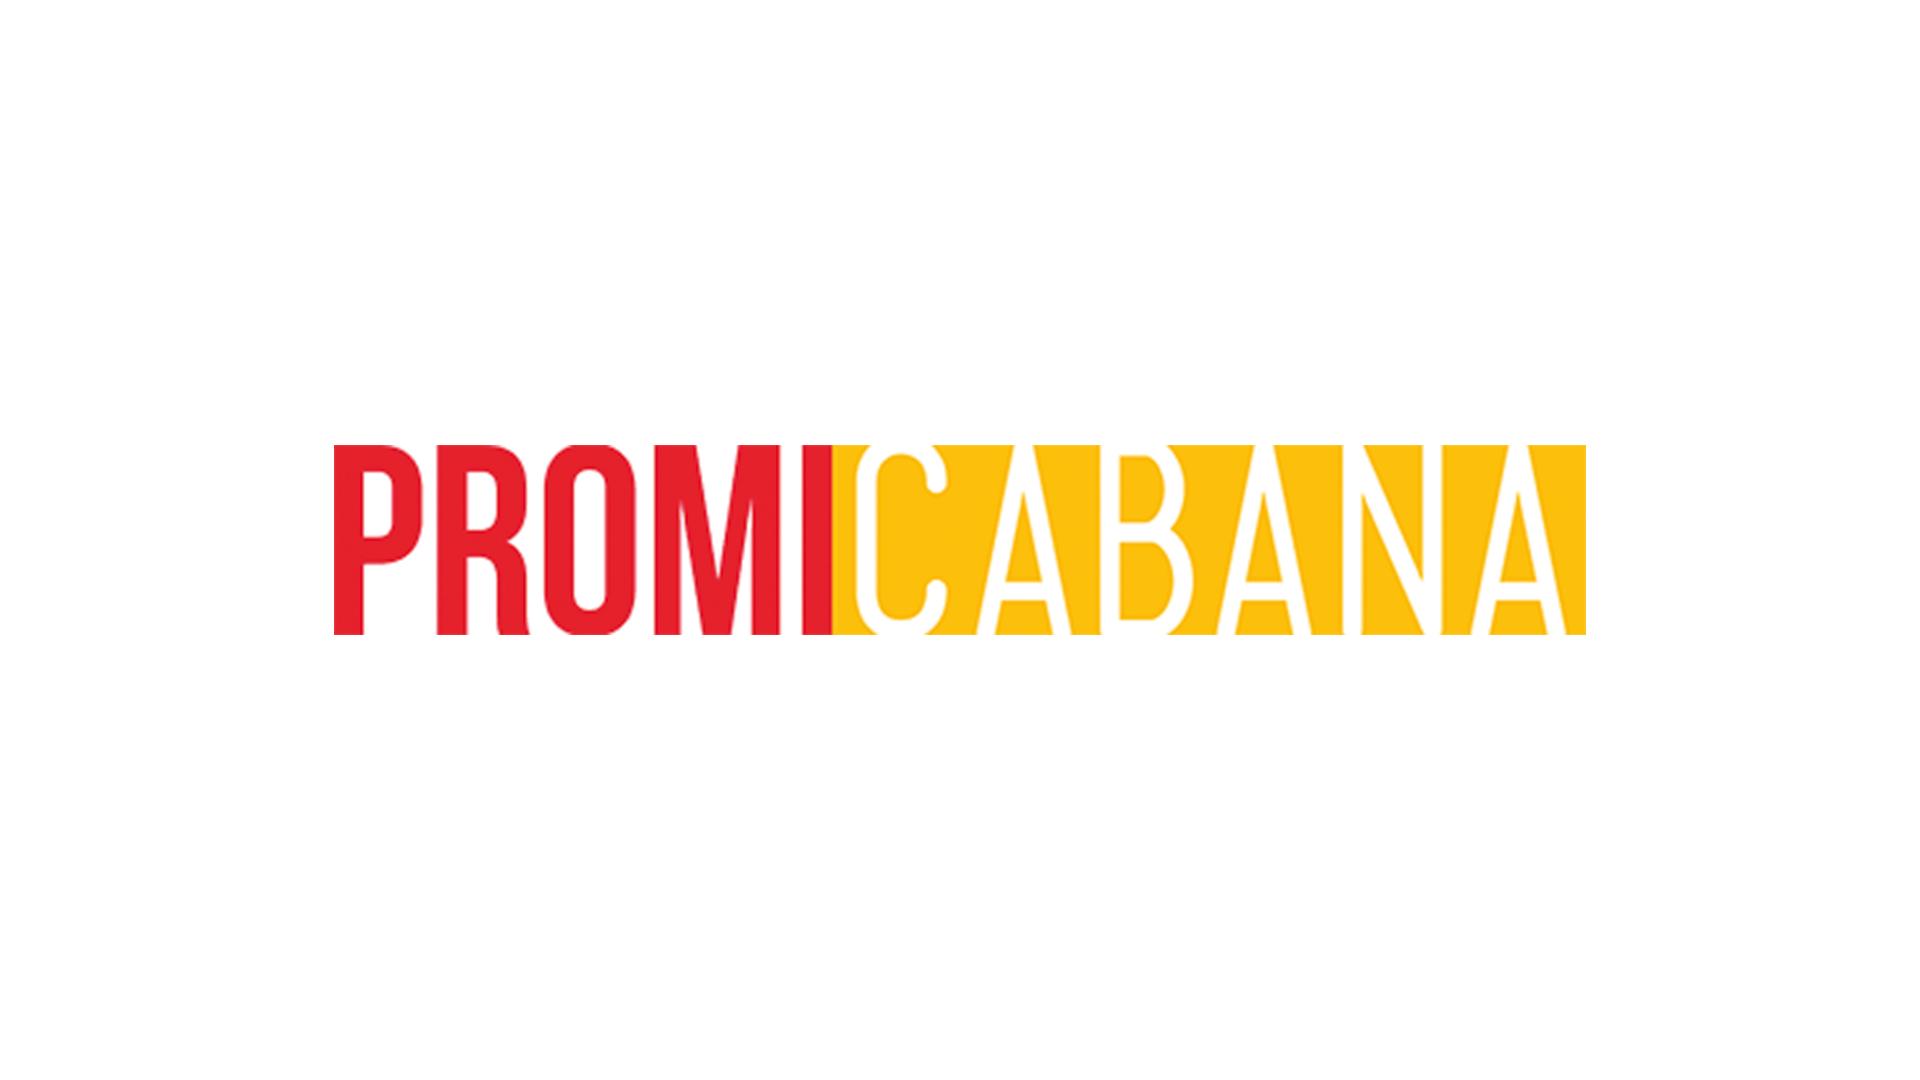 Justin-Timberlake-Jimmy-Fellon-Rap